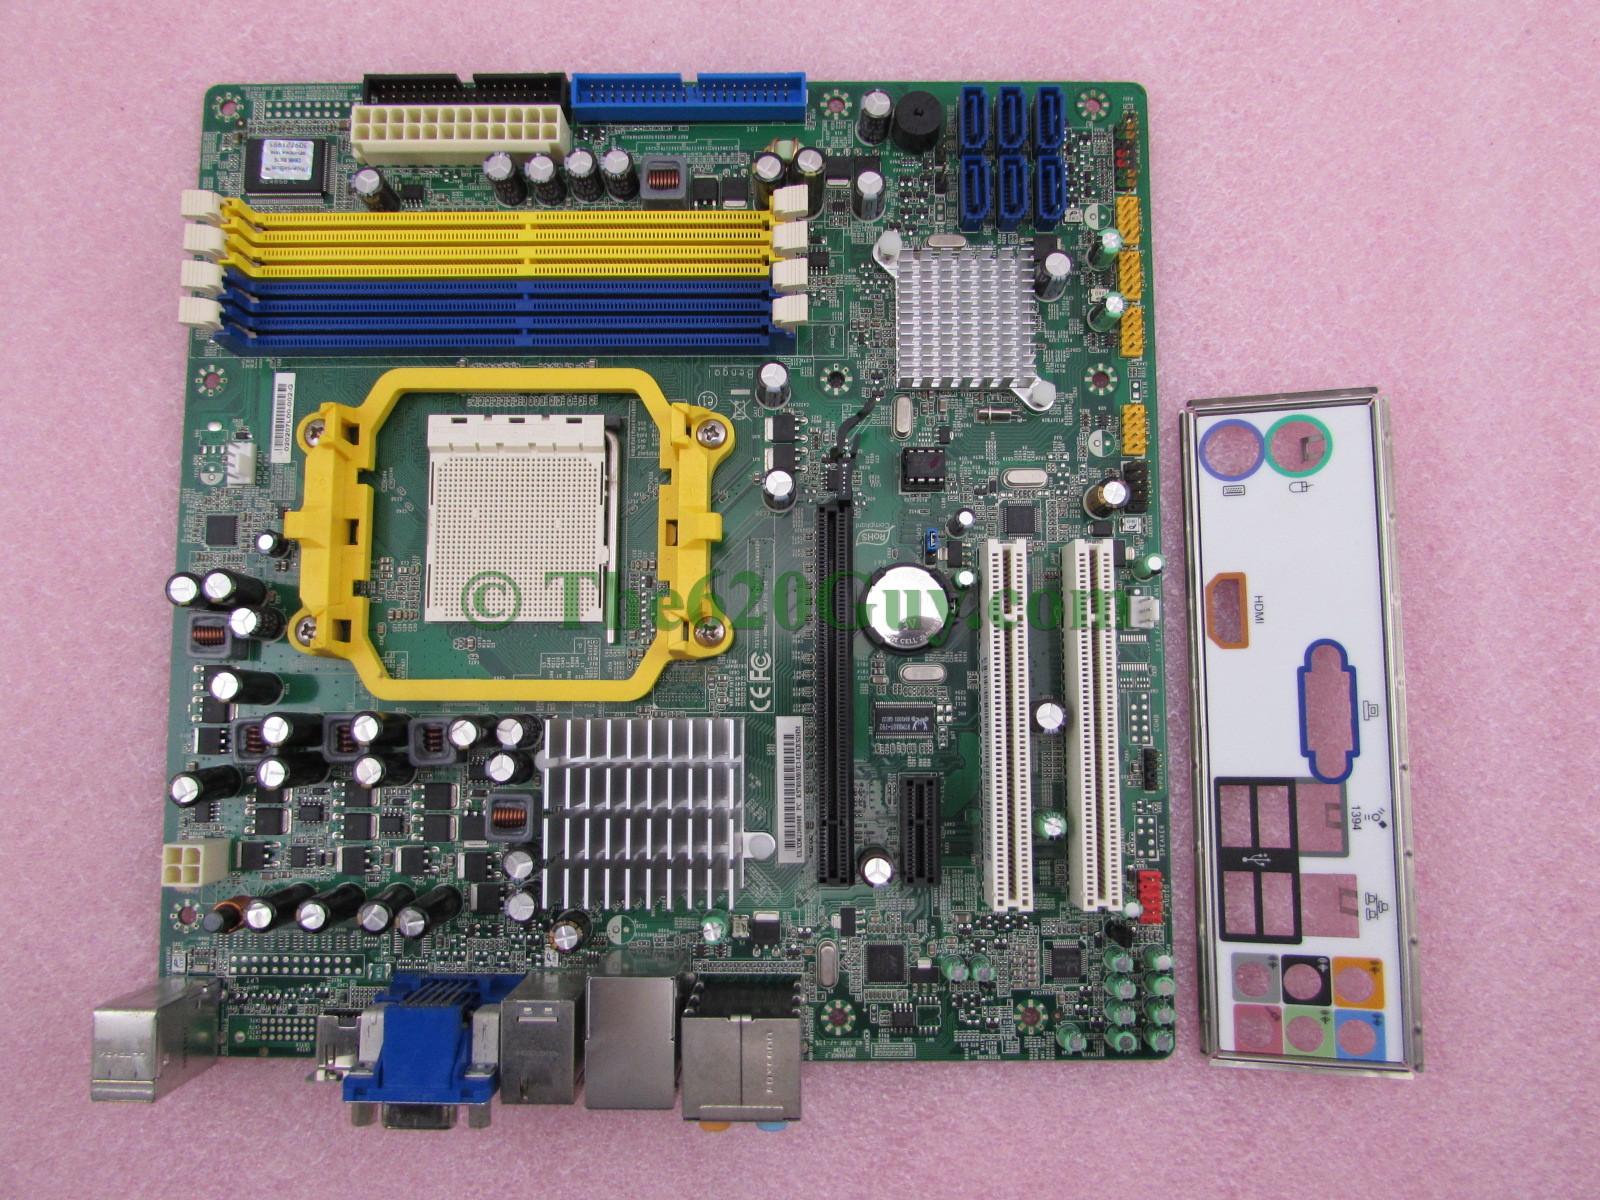 Atari 2600 Wiring Diagram Auto Electrical 1976 1000 Cc Honda Goldwing Gateway Dx4300 Motherboard Pc